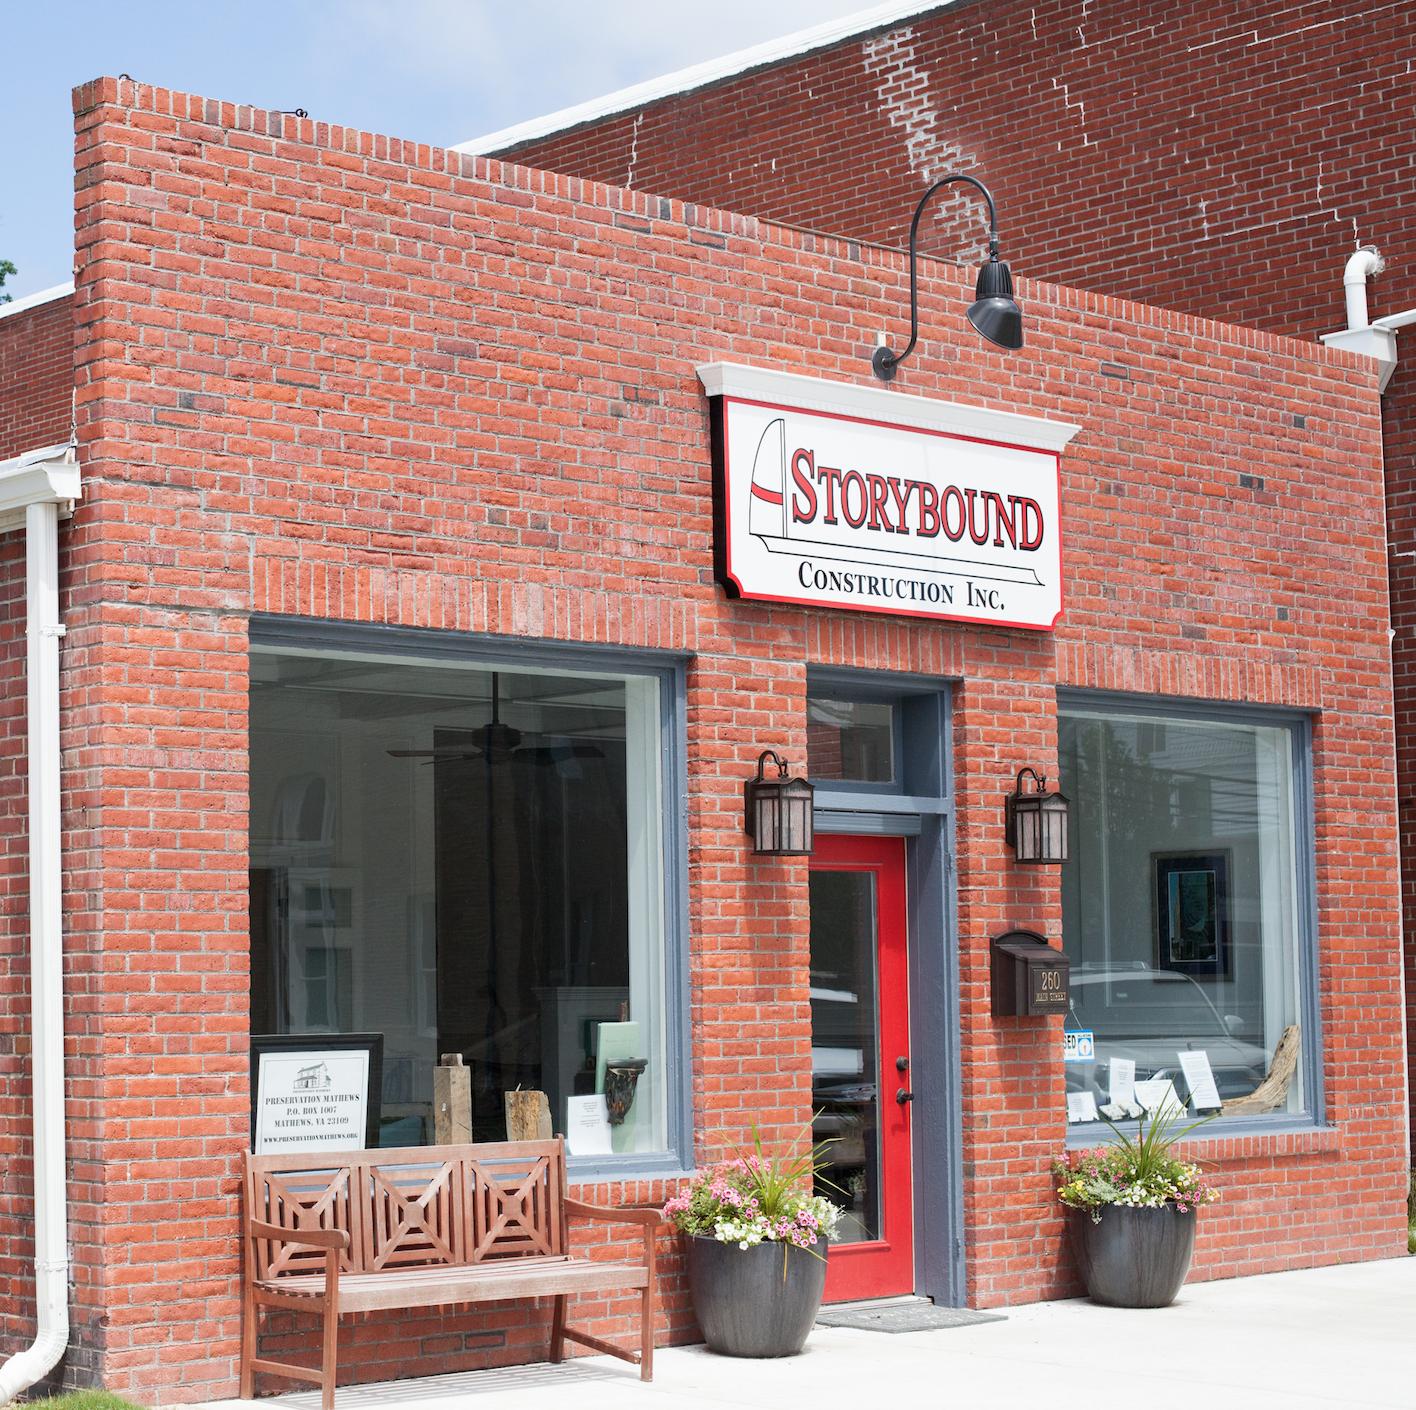 Storybound Construction, Inc. Exterior